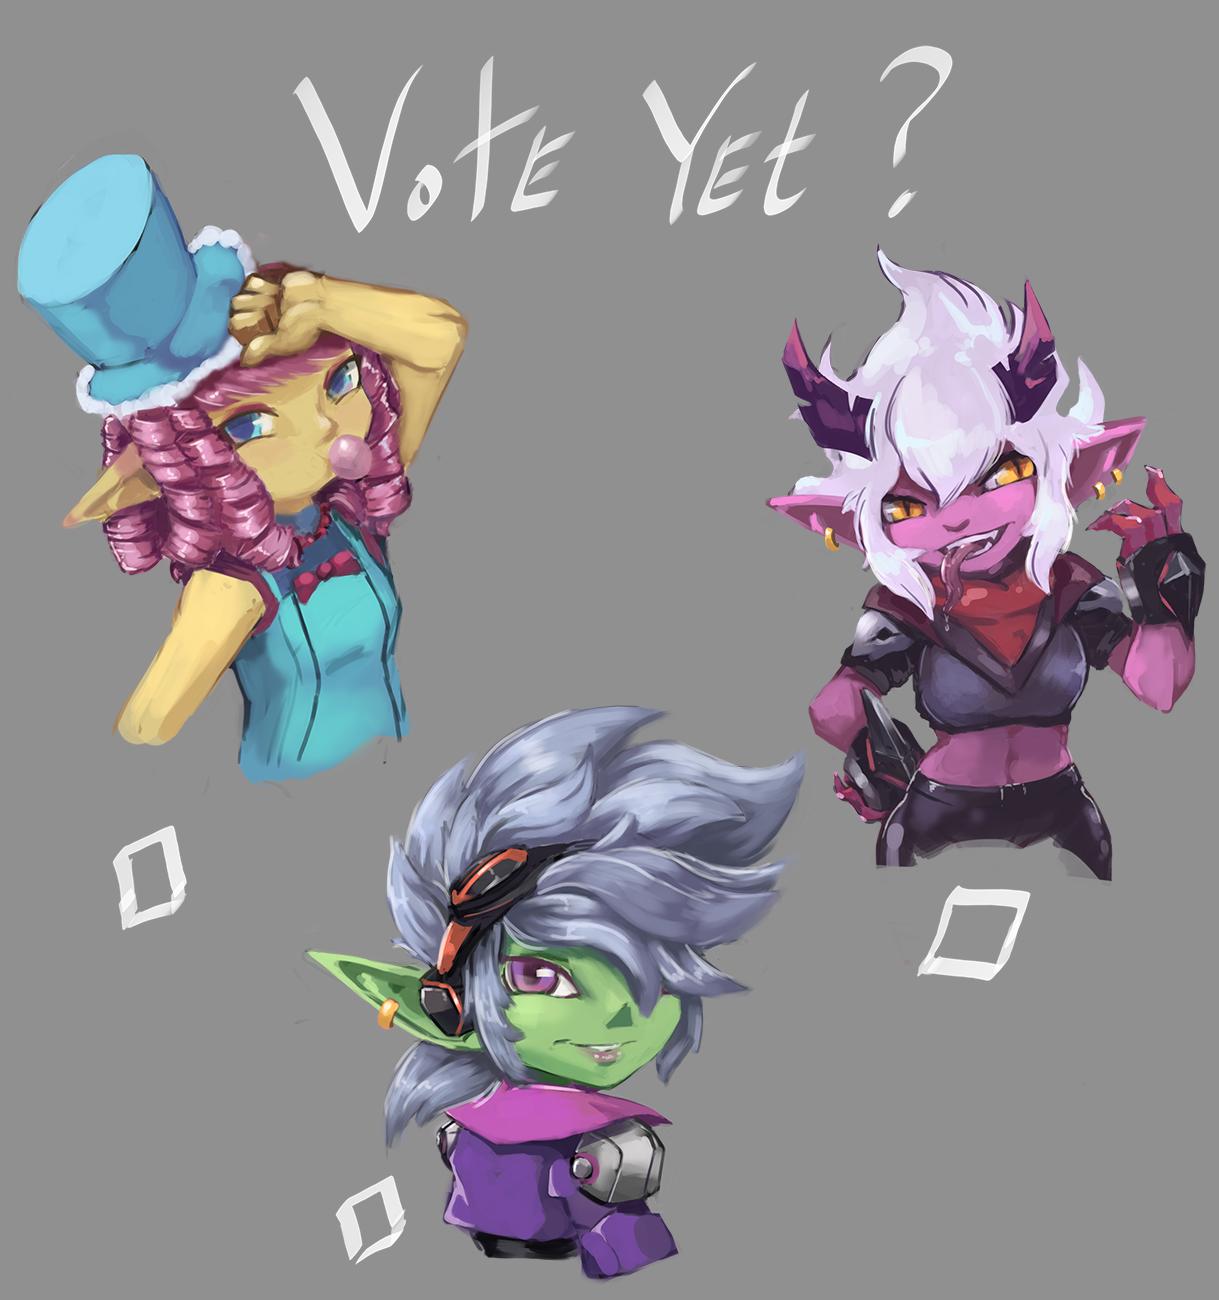 Voted?